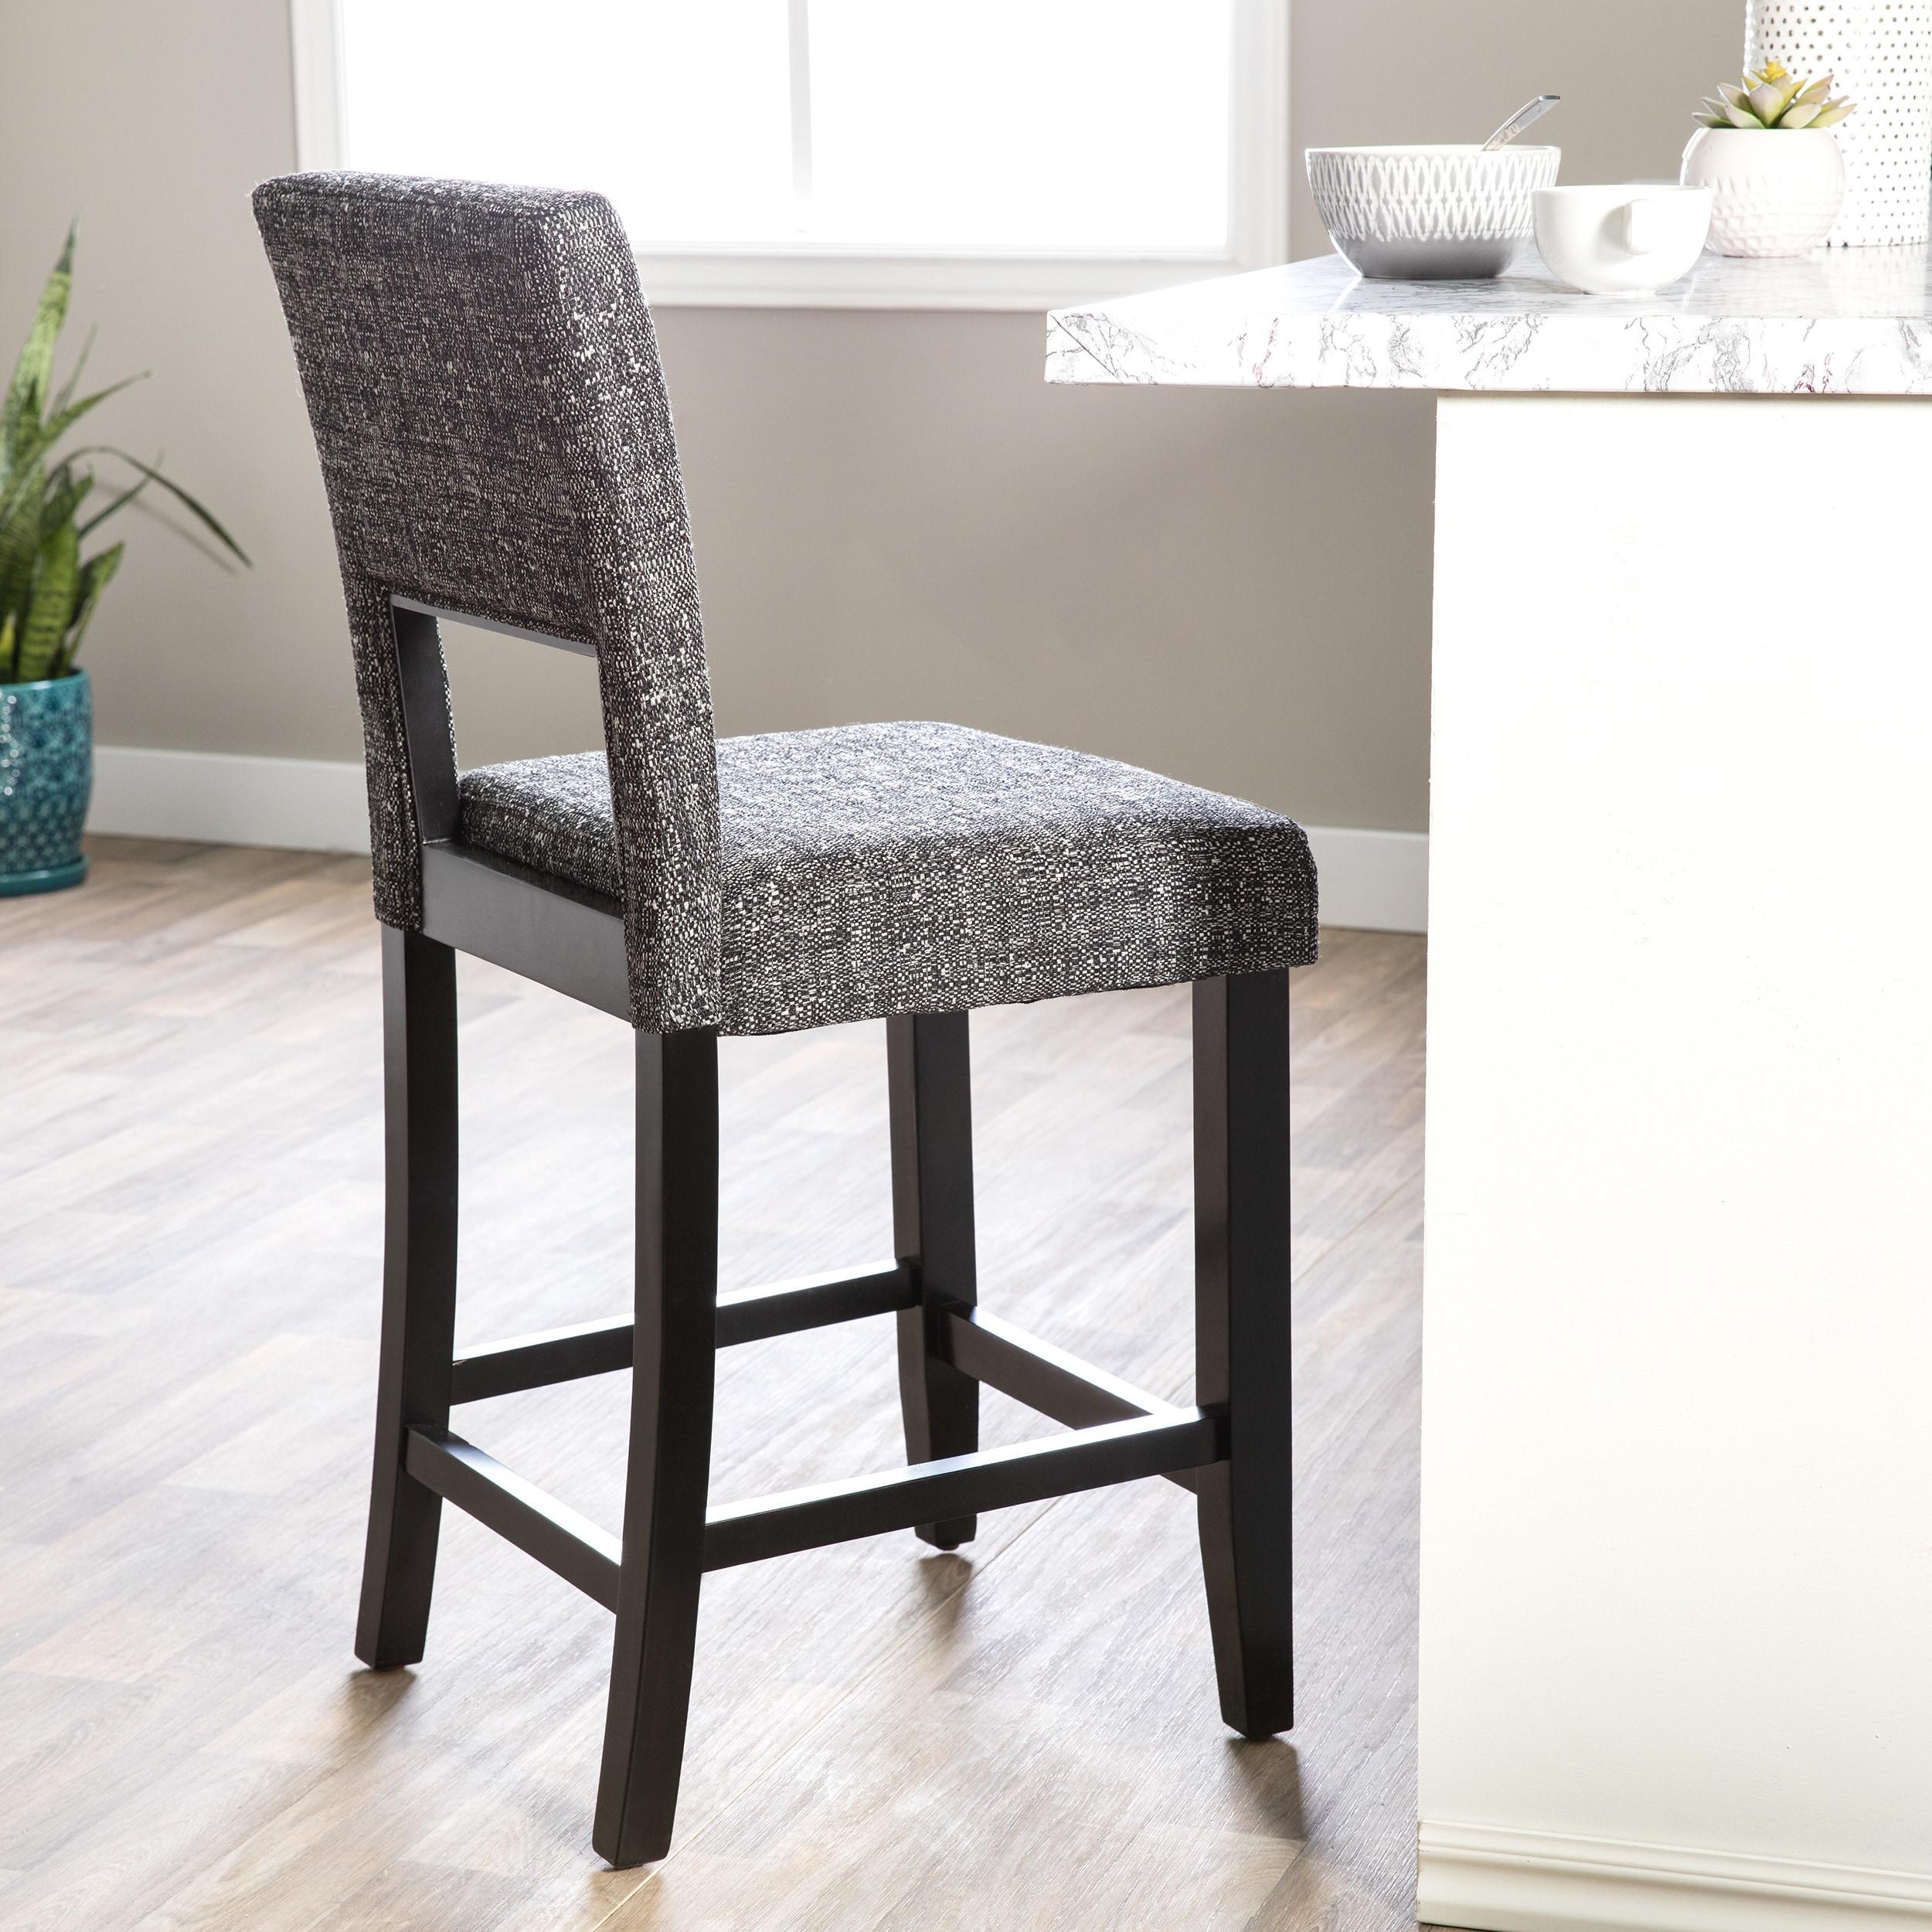 Terrific Linon Zeta Stationary Bar Stool Jet Black Tweed Fabric Unemploymentrelief Wooden Chair Designs For Living Room Unemploymentrelieforg